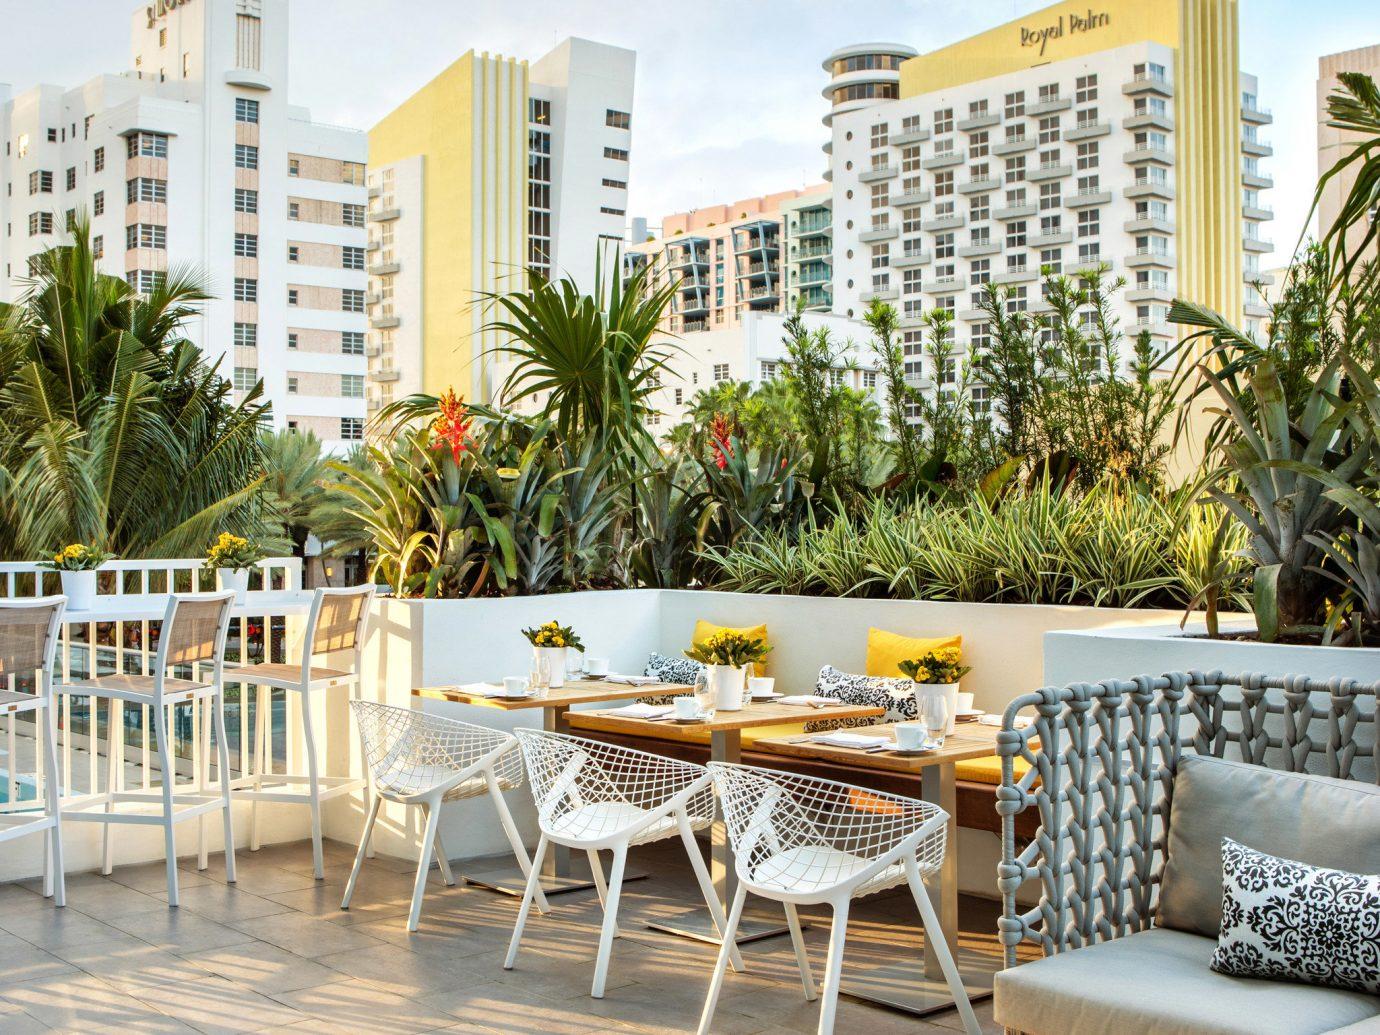 Budget outdoor sky ground walkway condominium vacation home estate backyard interior design outdoor structure plaza Resort apartment